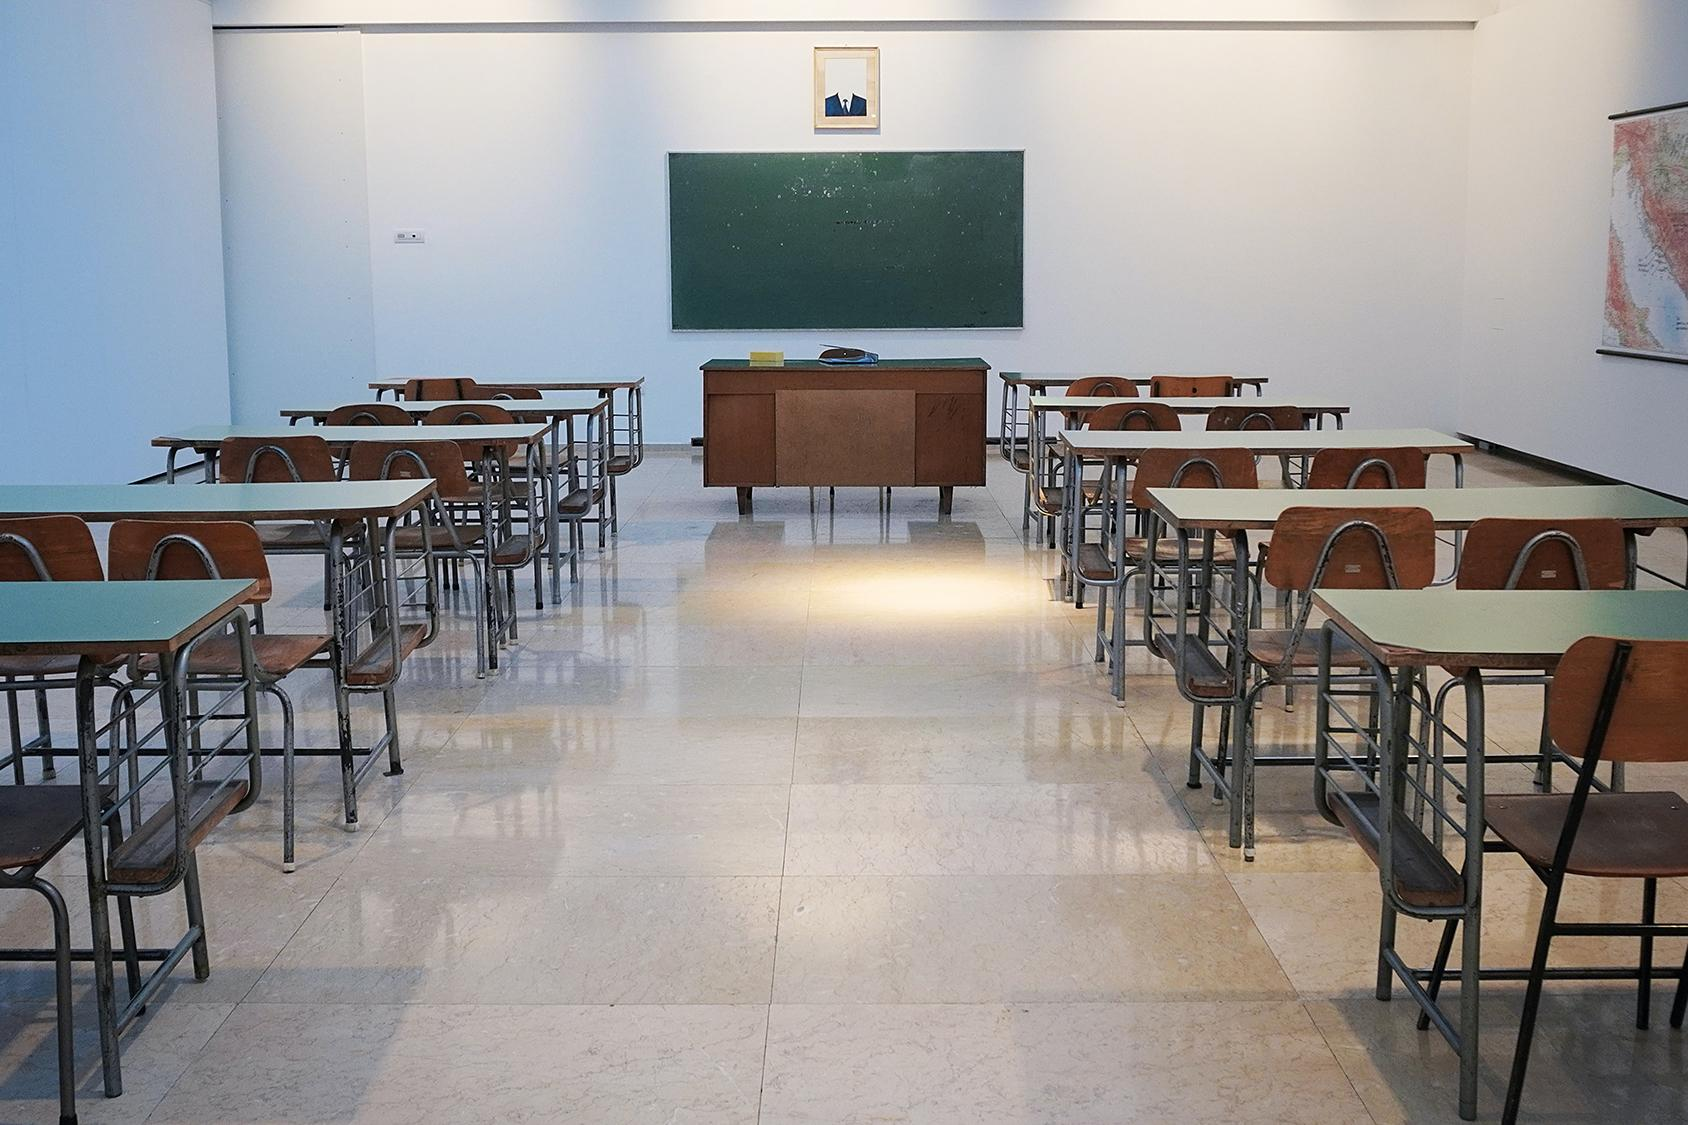 Classroom with desks and blackboard and teacher's desk